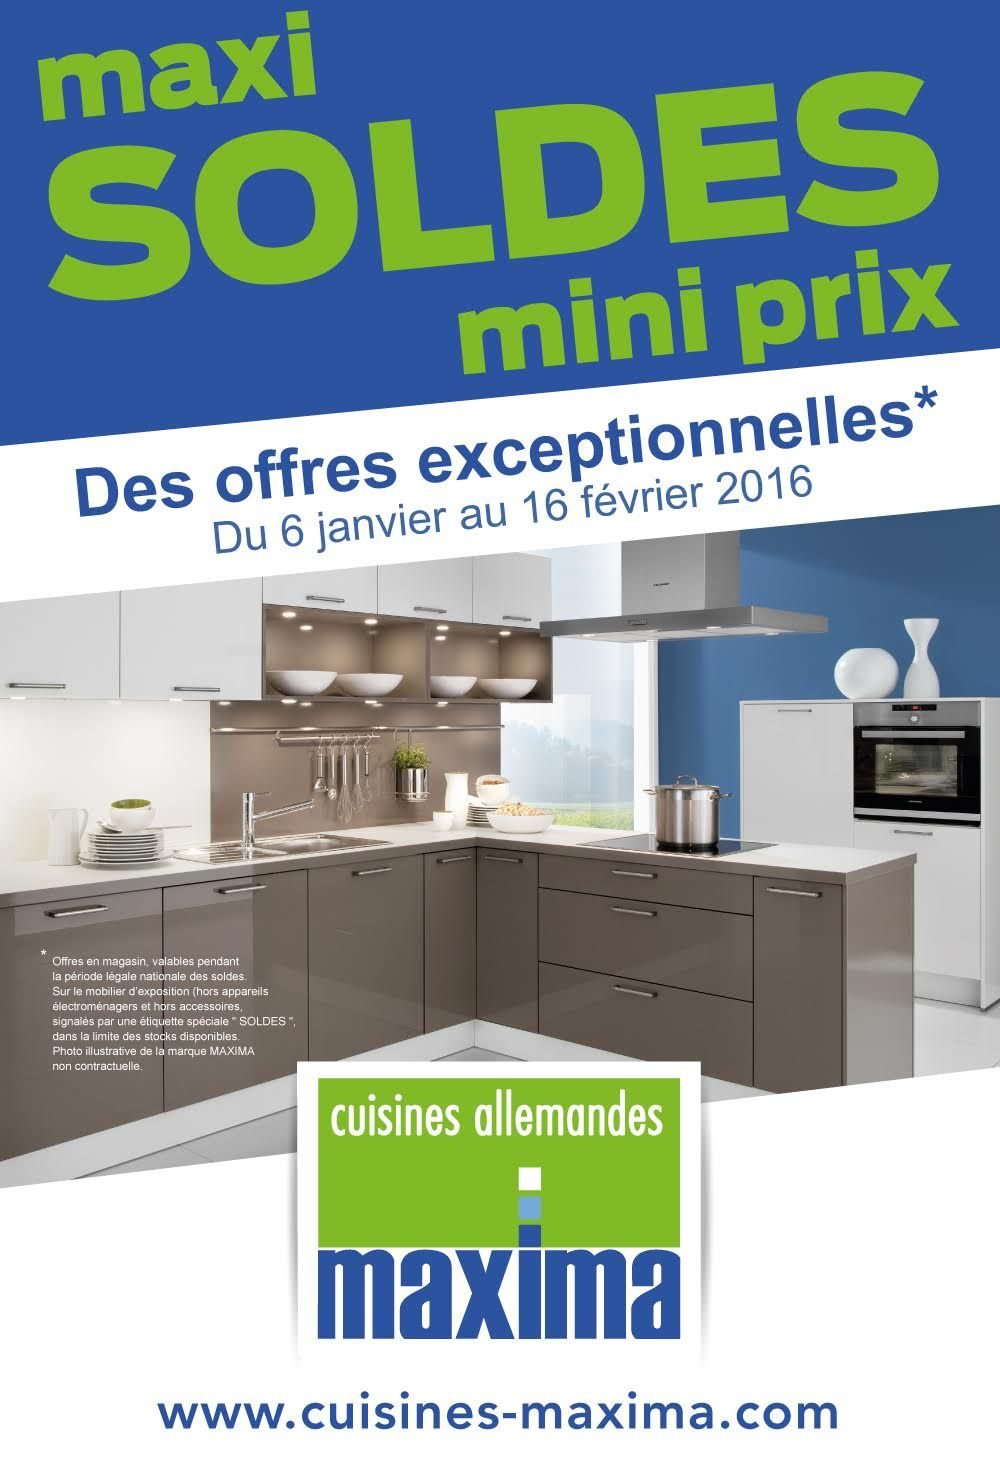 Maxi Soldes Mini Prix Pour Les Cuisines Maxima Prix Cuisine Cuisine Soldes